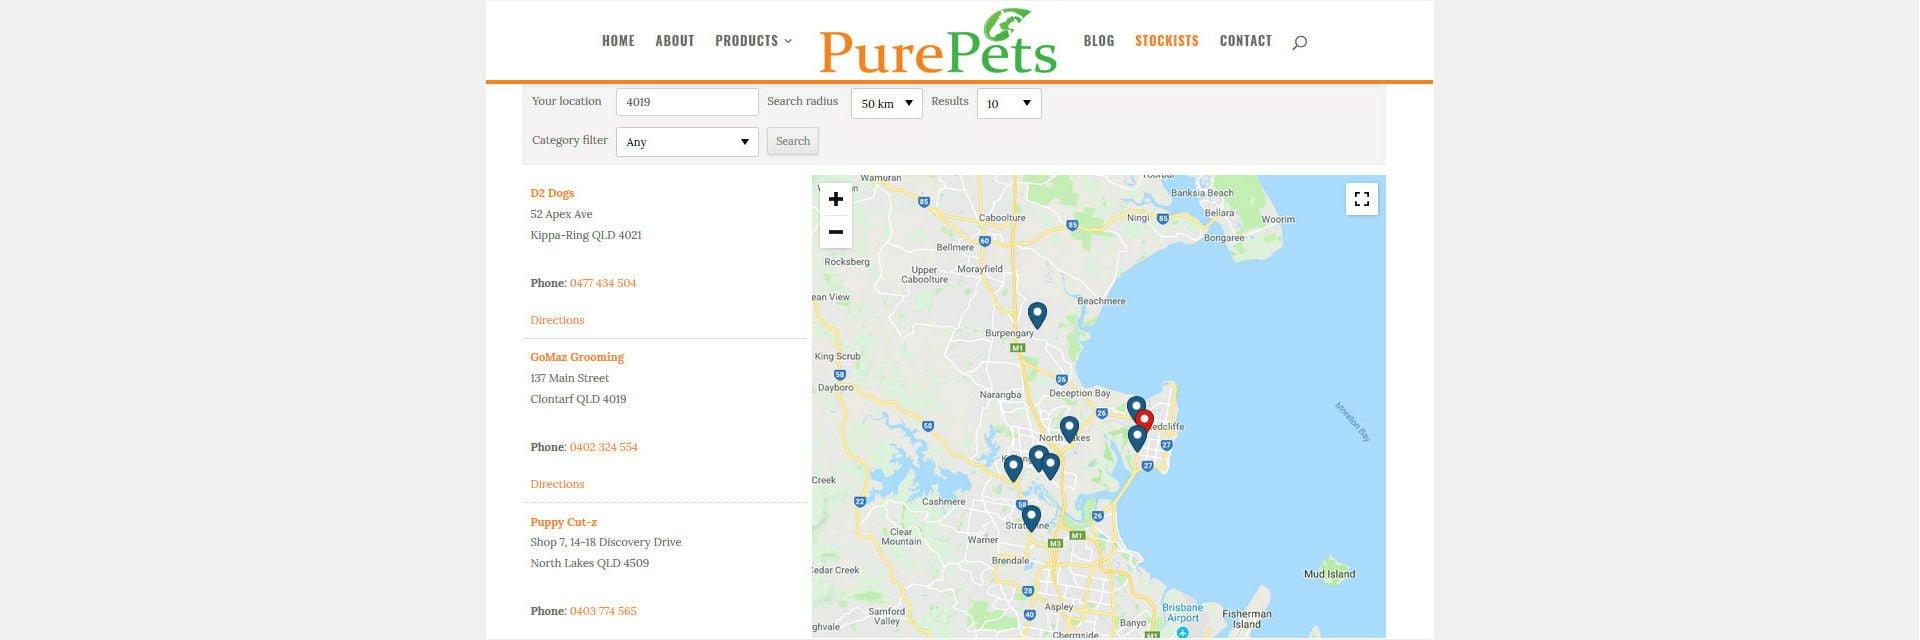 PurePets Store Locator - Australia wide